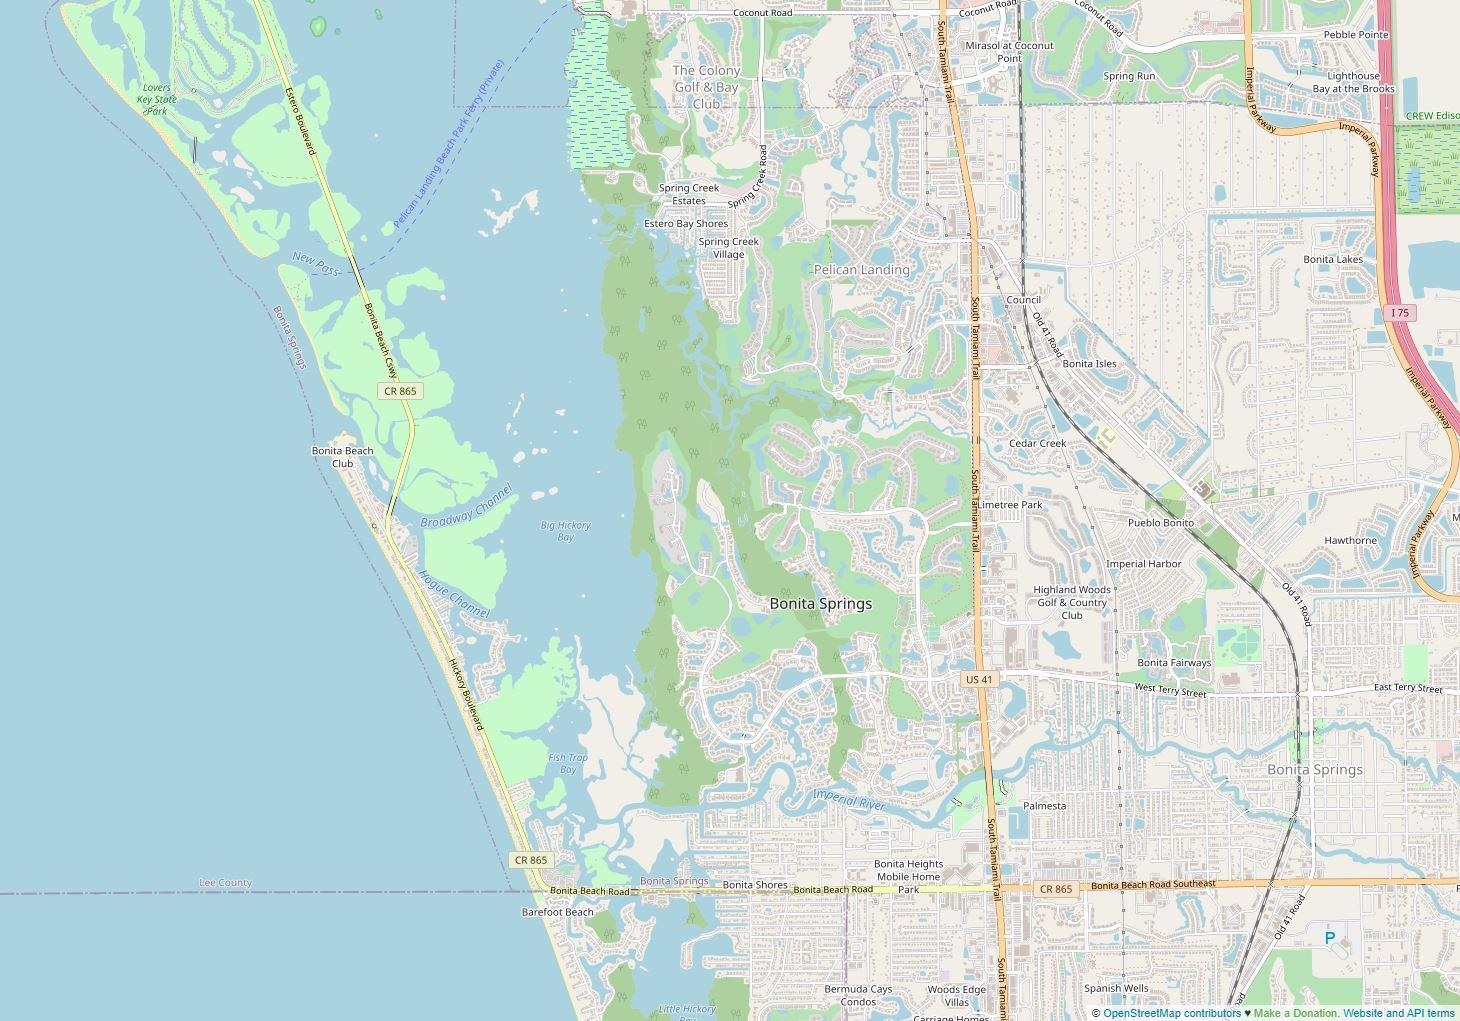 Spend your winter in Bonita Springs, Florida: Is Bonita Springs a good snowbird location? 4